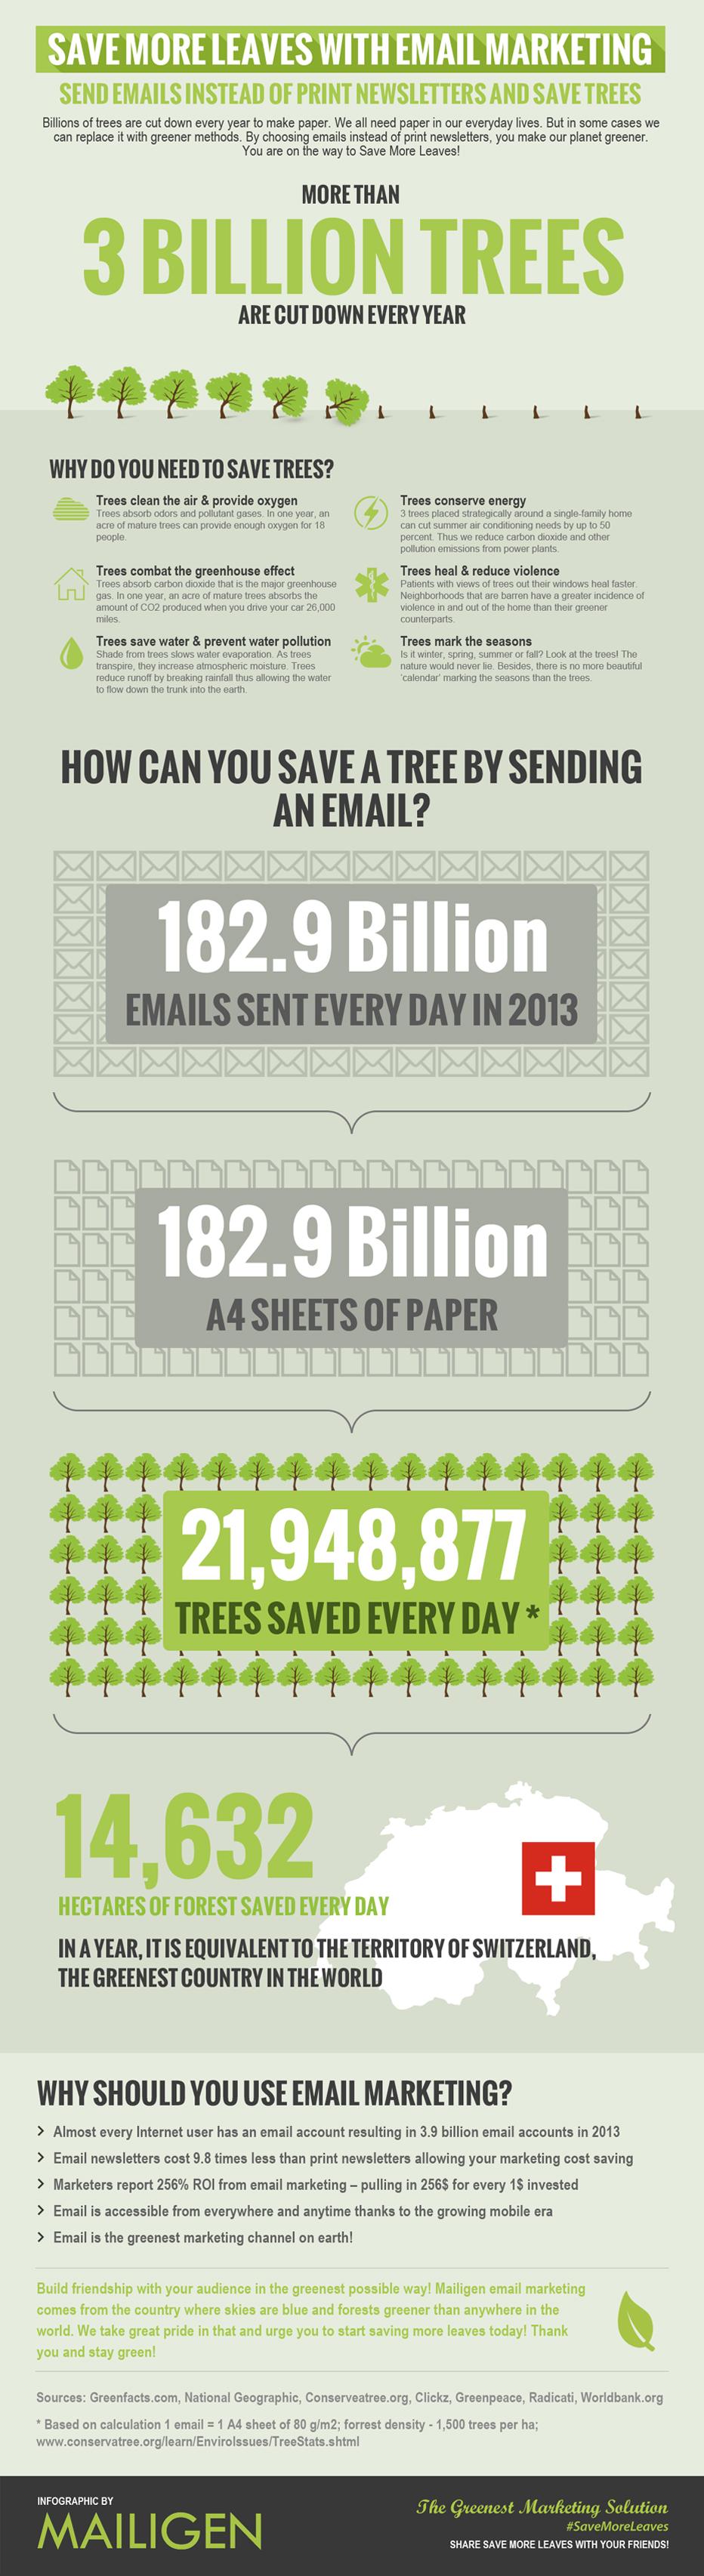 Infografía Emal Marketing ecológico MAILIGEN